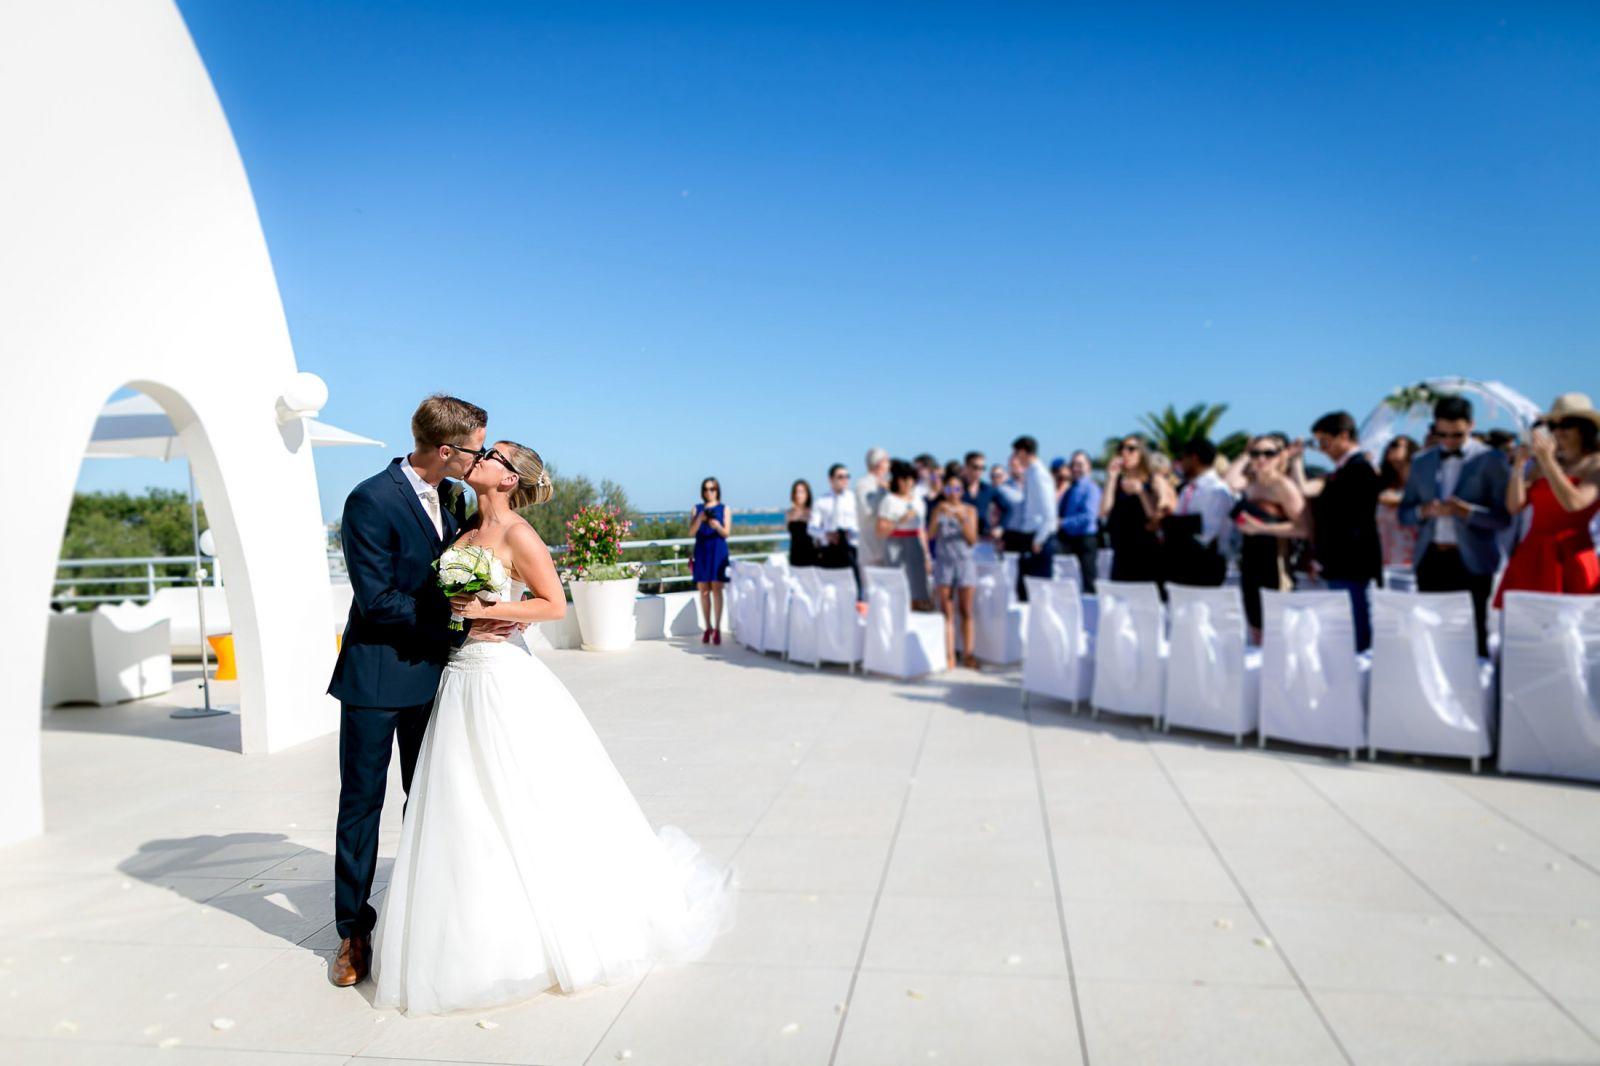 photographe mariage montpellier